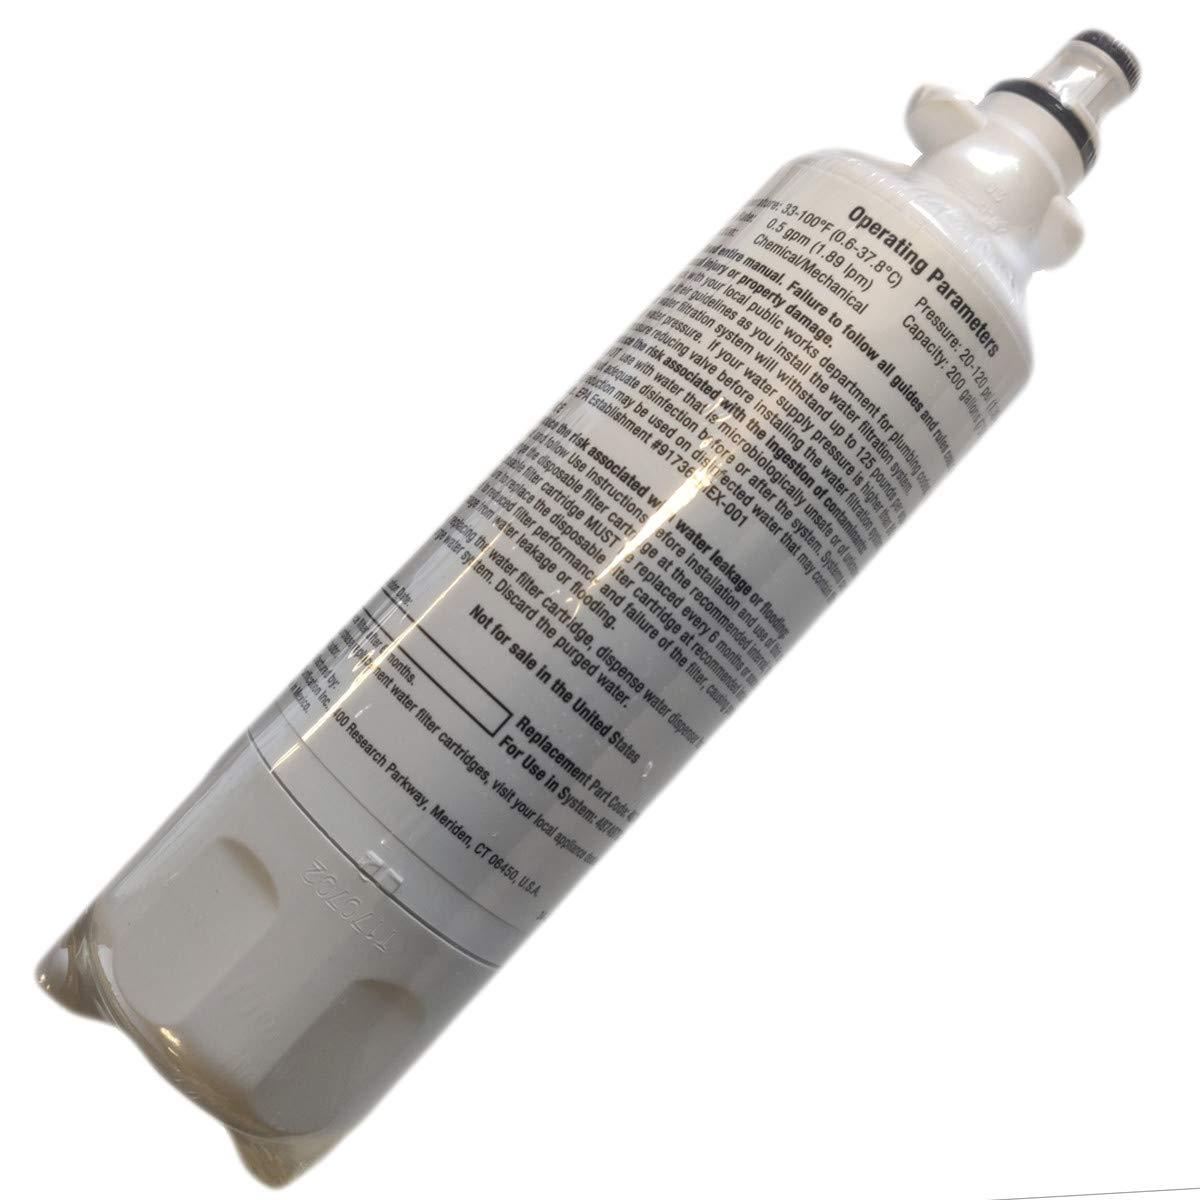 Cartucho de filtro de agua - Frigorífico, congelador - Beko ...